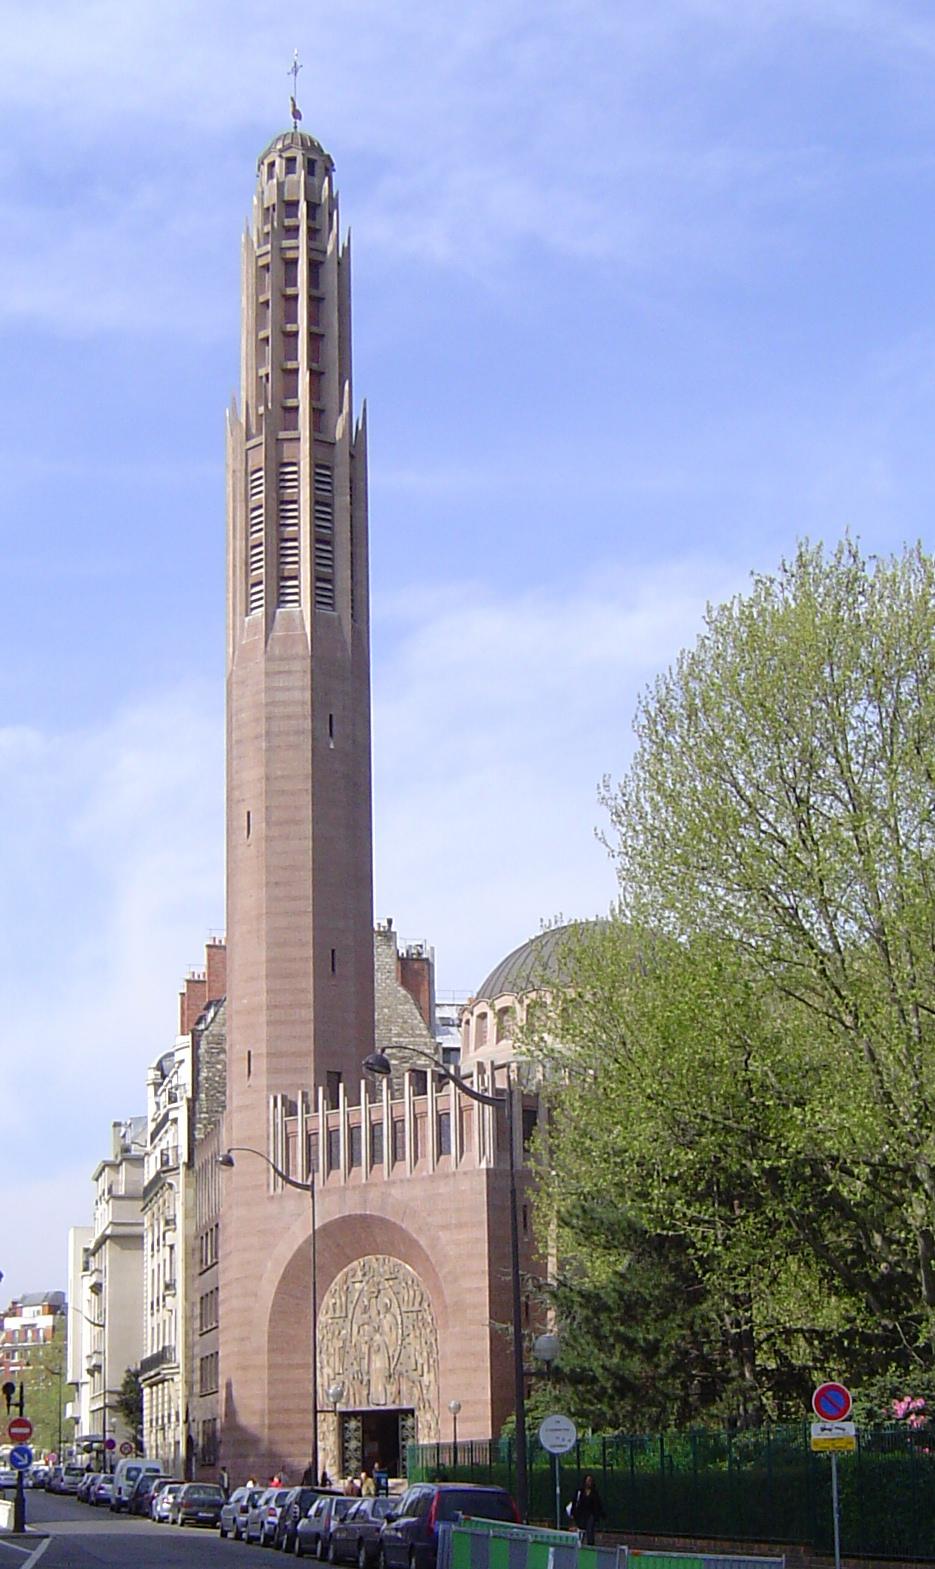 http://upload.wikimedia.org/wikipedia/commons/0/0c/Paris_-_%C3%A9glise_Sainte-Odile_(10).JPG